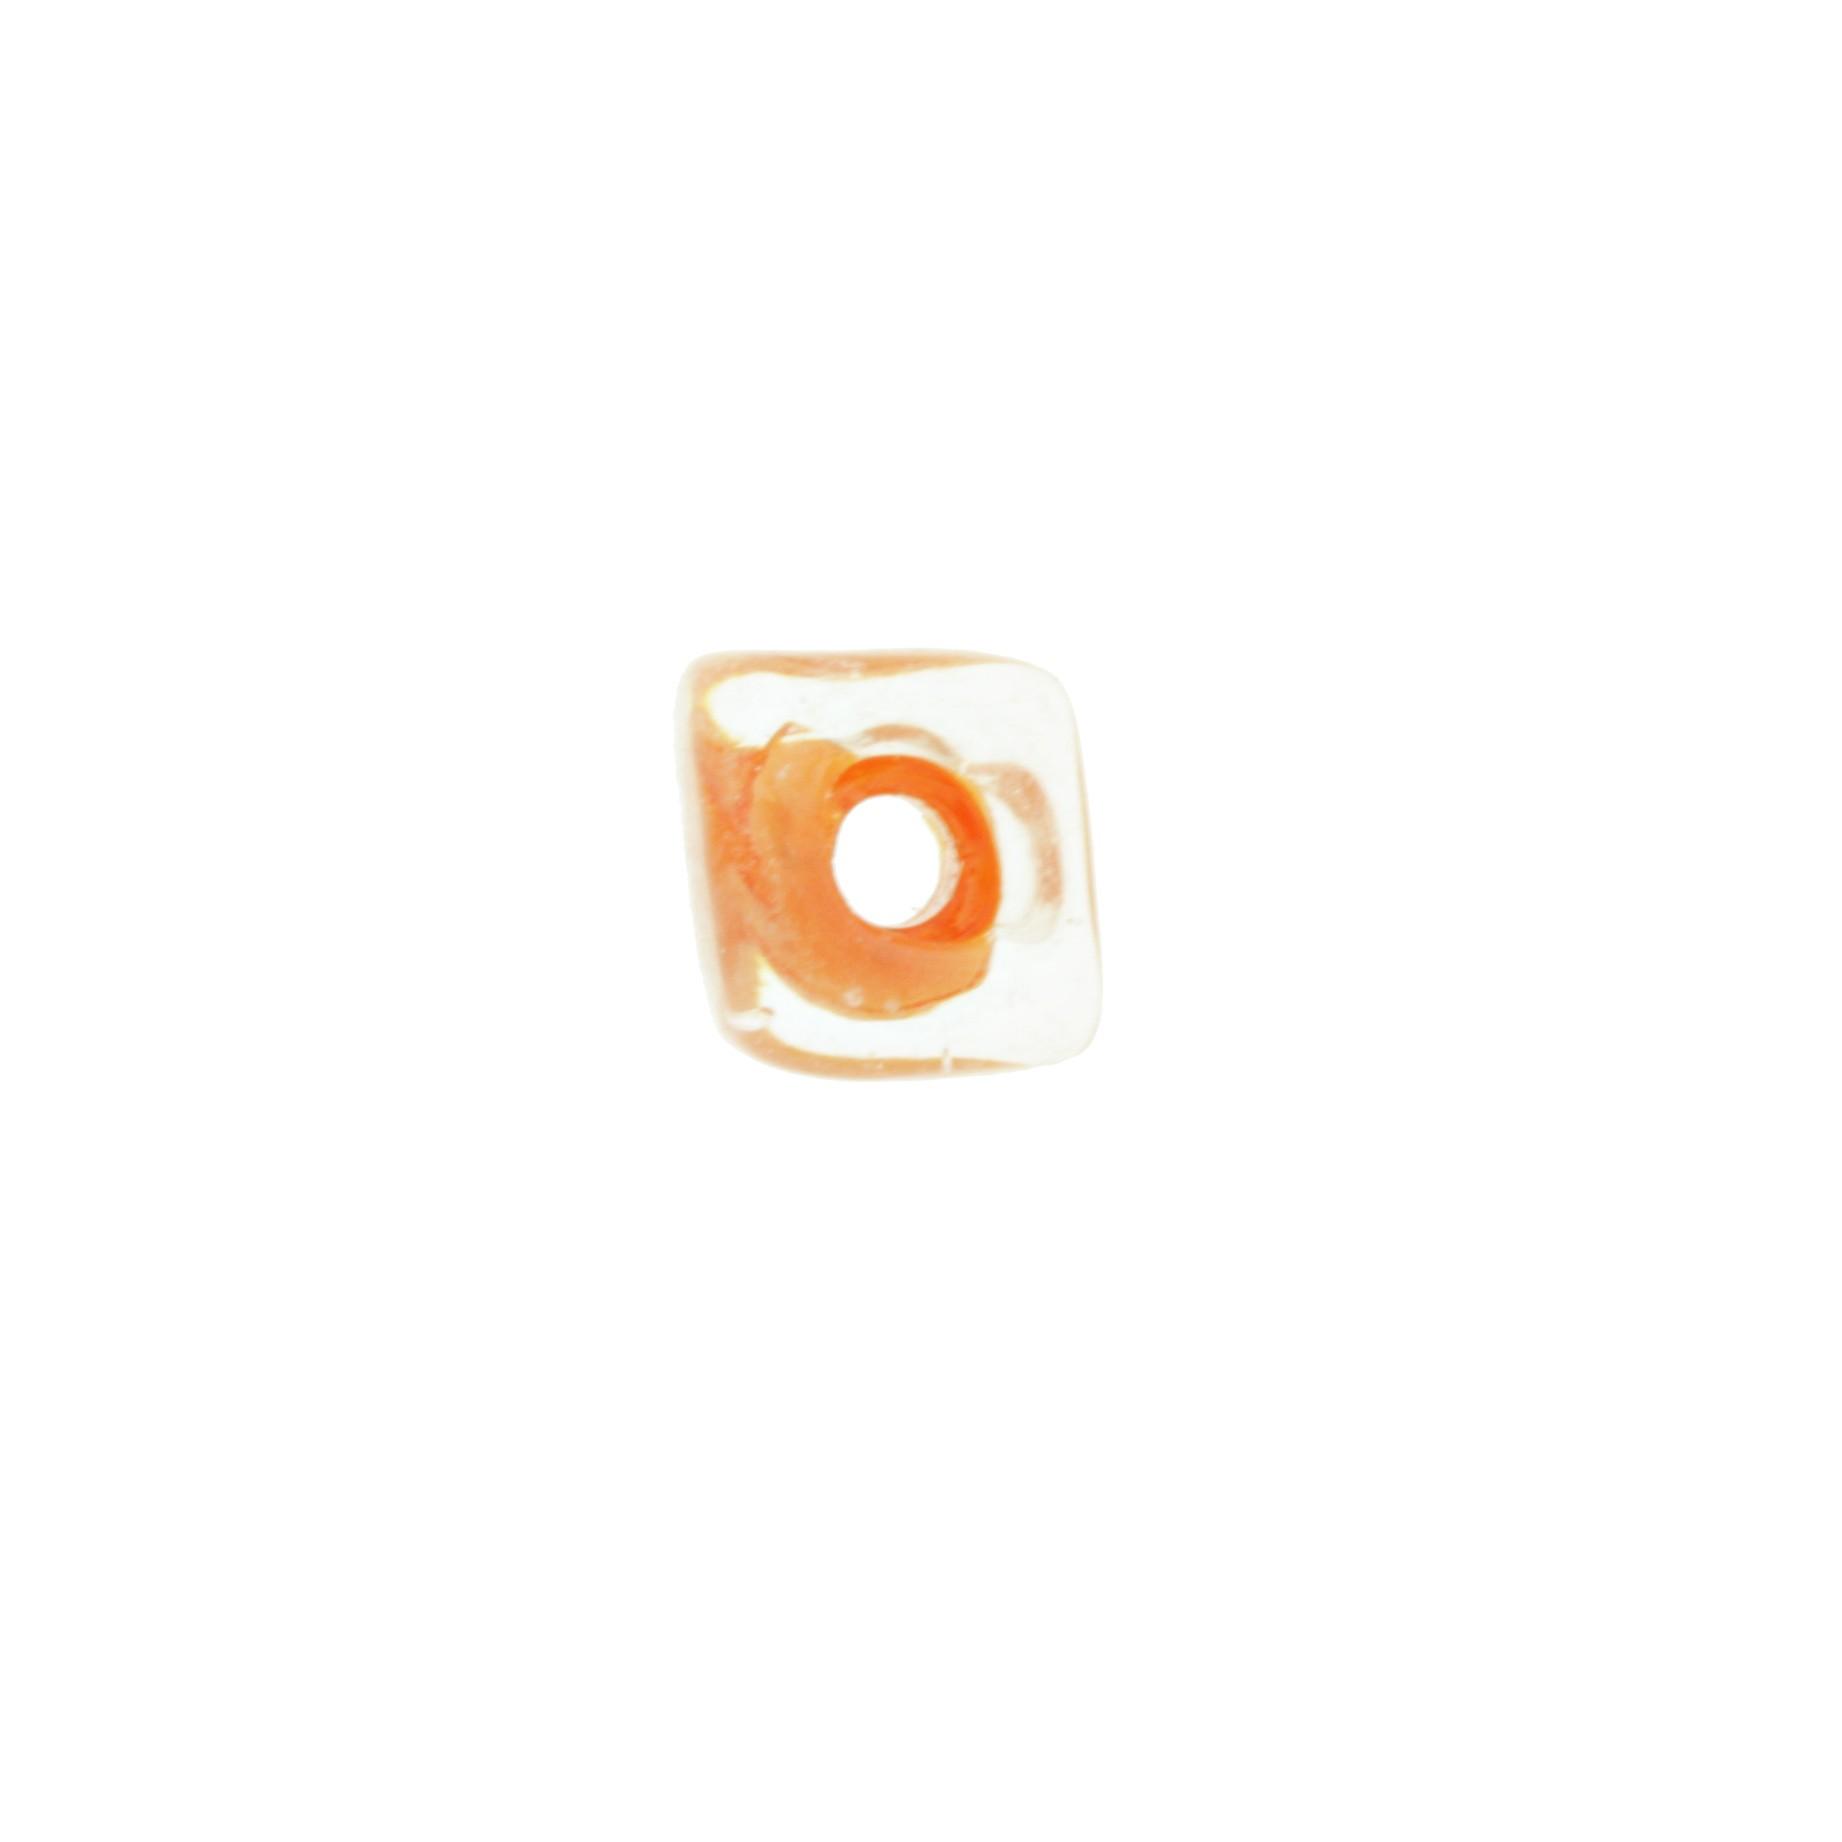 Cubo Vidro - Transparente e Laranja - Ref.: MC148  - Stéphanie Bijoux® - Peças para Bijuterias e Artesanato